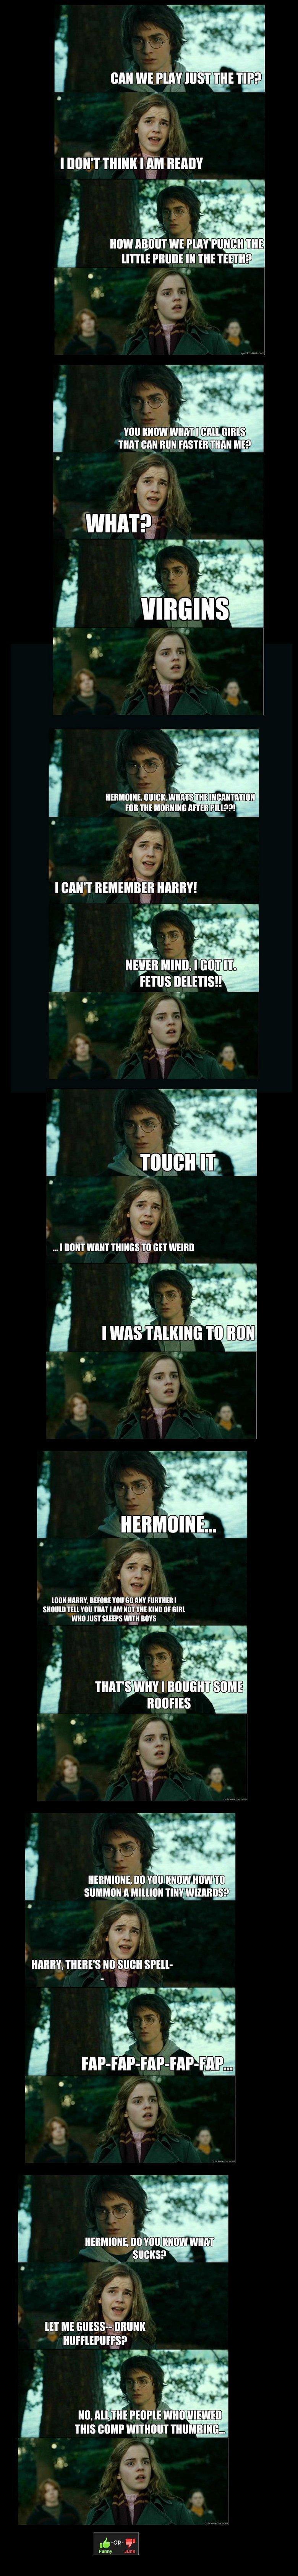 oh Harry. Another Horny Harry comp: . i [IAN WE MAY HIST THE TIP? wtt, I DON' T THINK iia READY i tir, I nun: WANT mkii' ti, an warm E I Jic, iii, I millar' . H